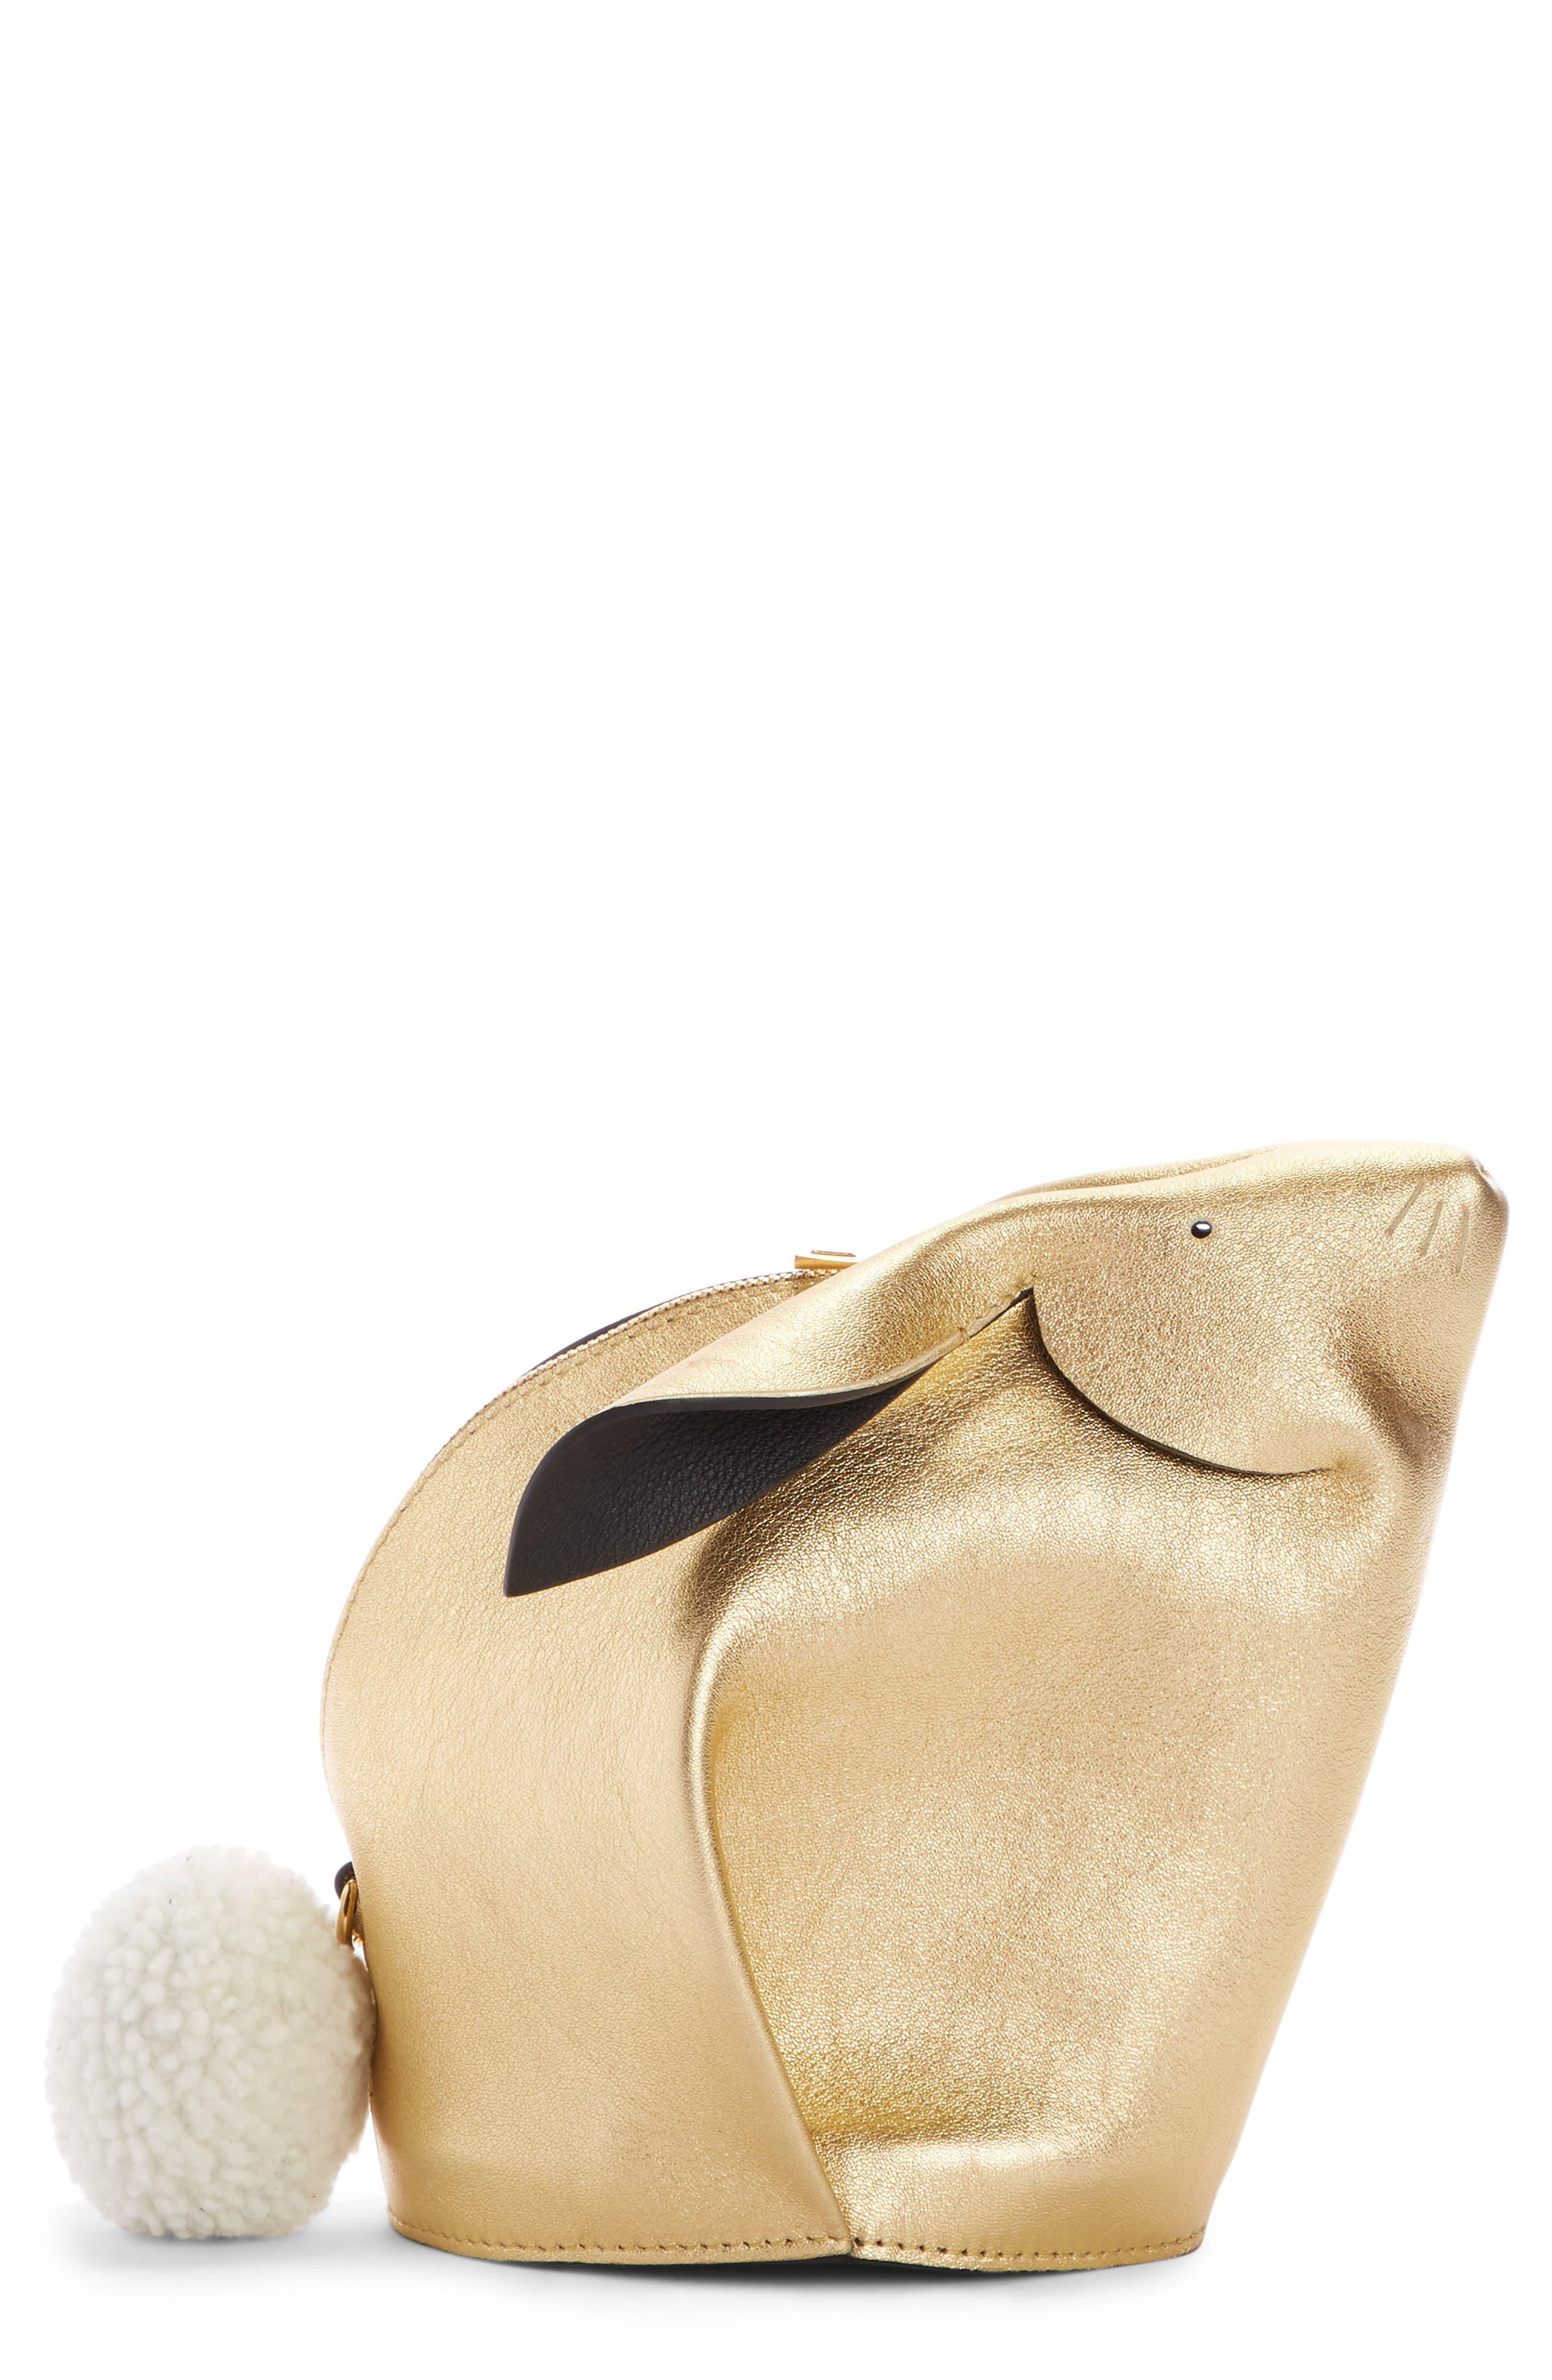 Mini Bunny Metallic Leather Crossbody Bag with Genuine Shearling Trim,                         Main,                         color, 710